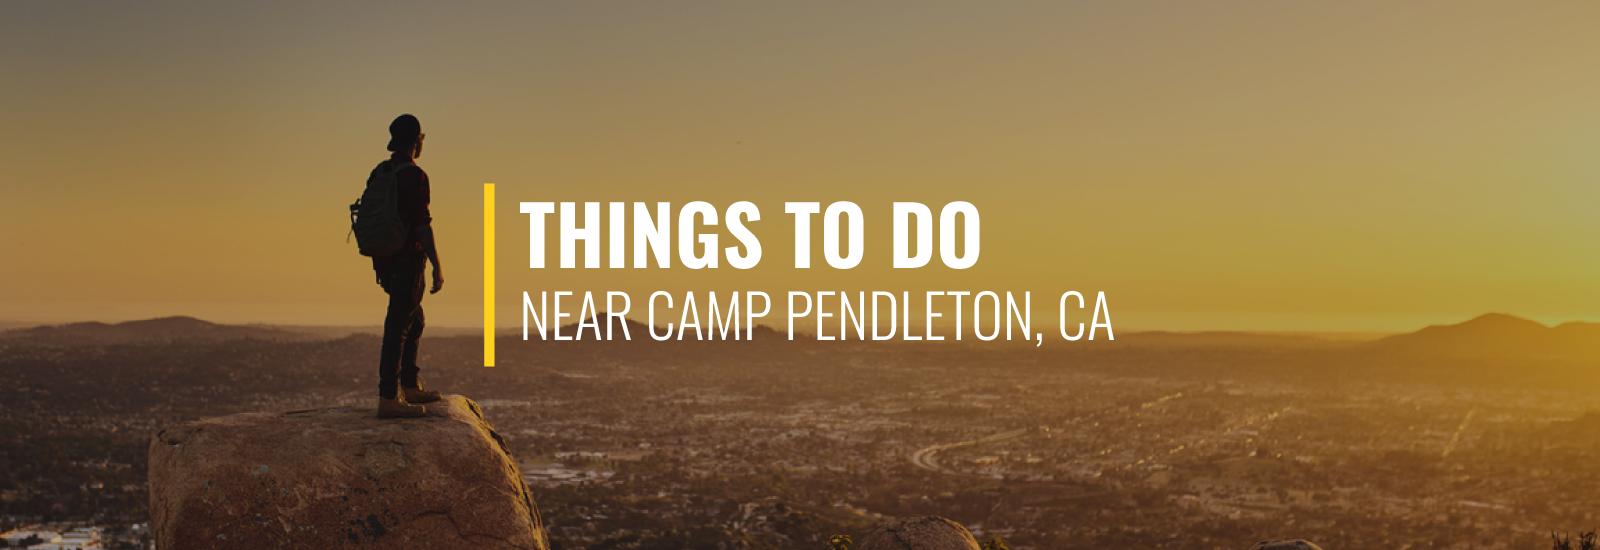 Things to Do Near Camp Pendleton, California